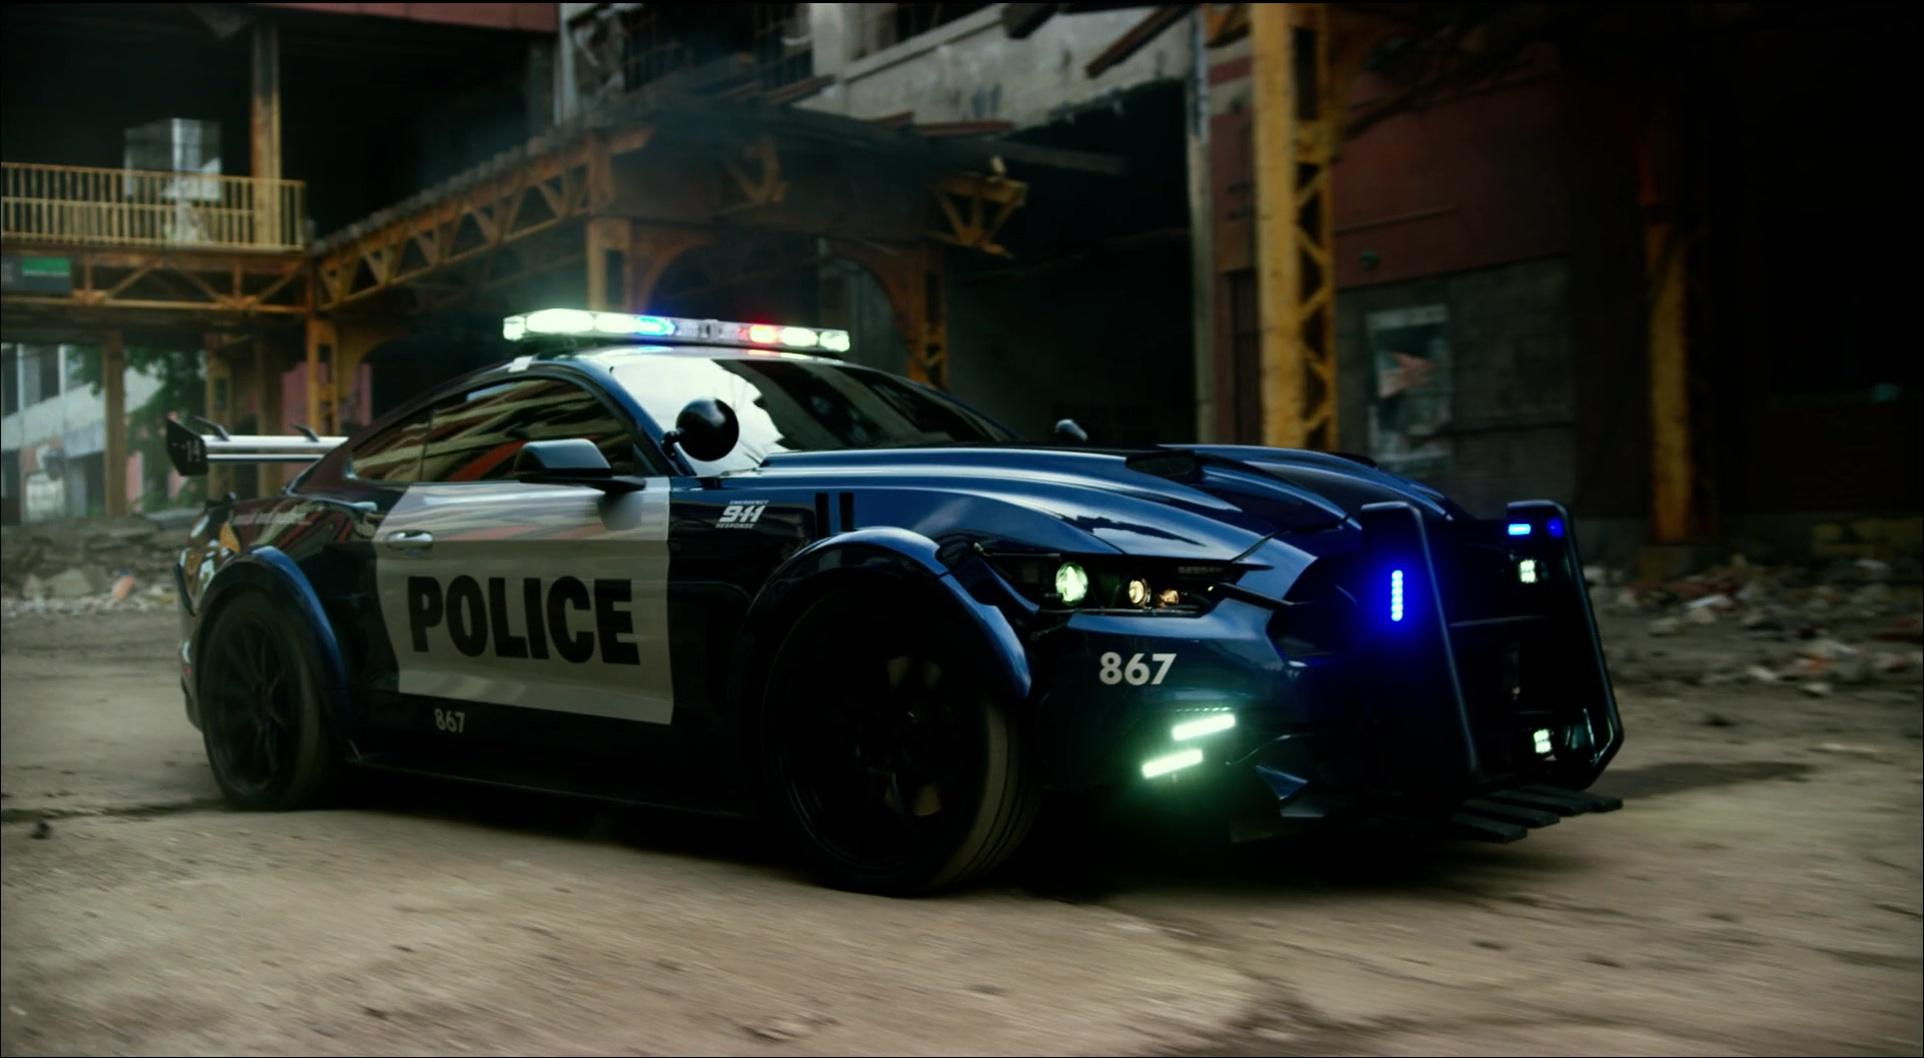 wallpaper police car transformers ford mustang 1924x1058 bankkkk 1248669 hd. Black Bedroom Furniture Sets. Home Design Ideas